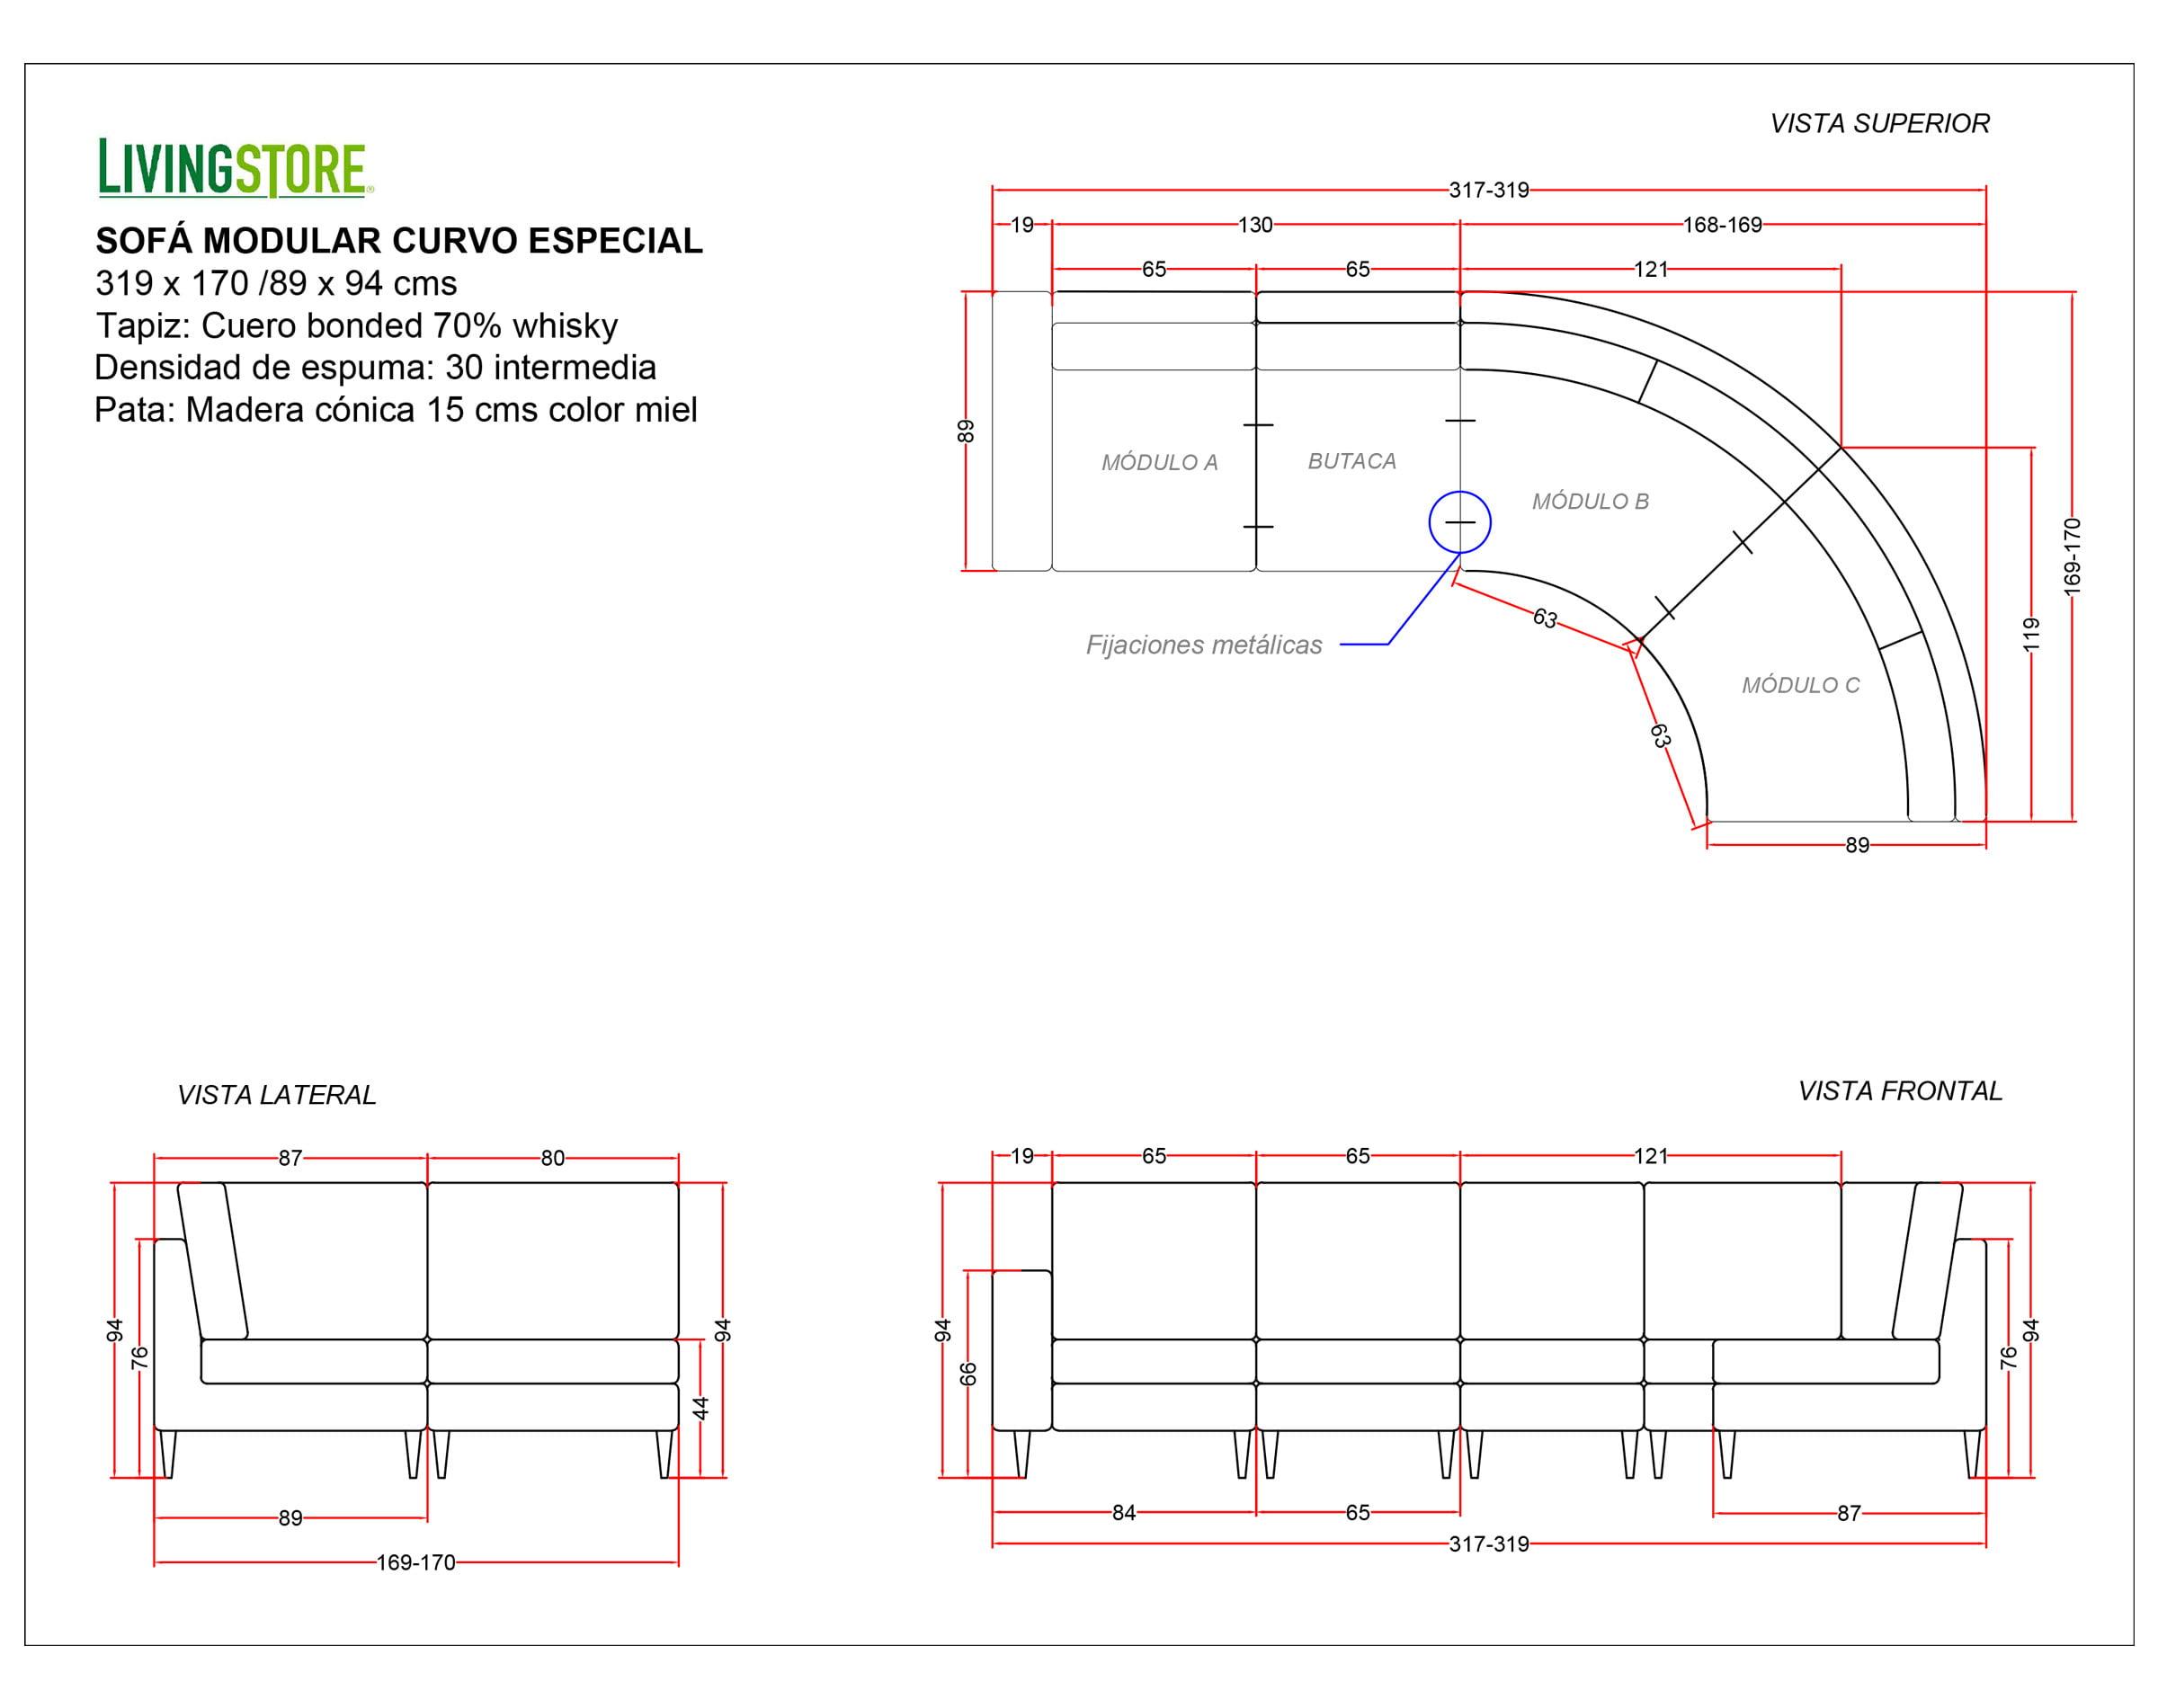 Planimetria Sofa Modular